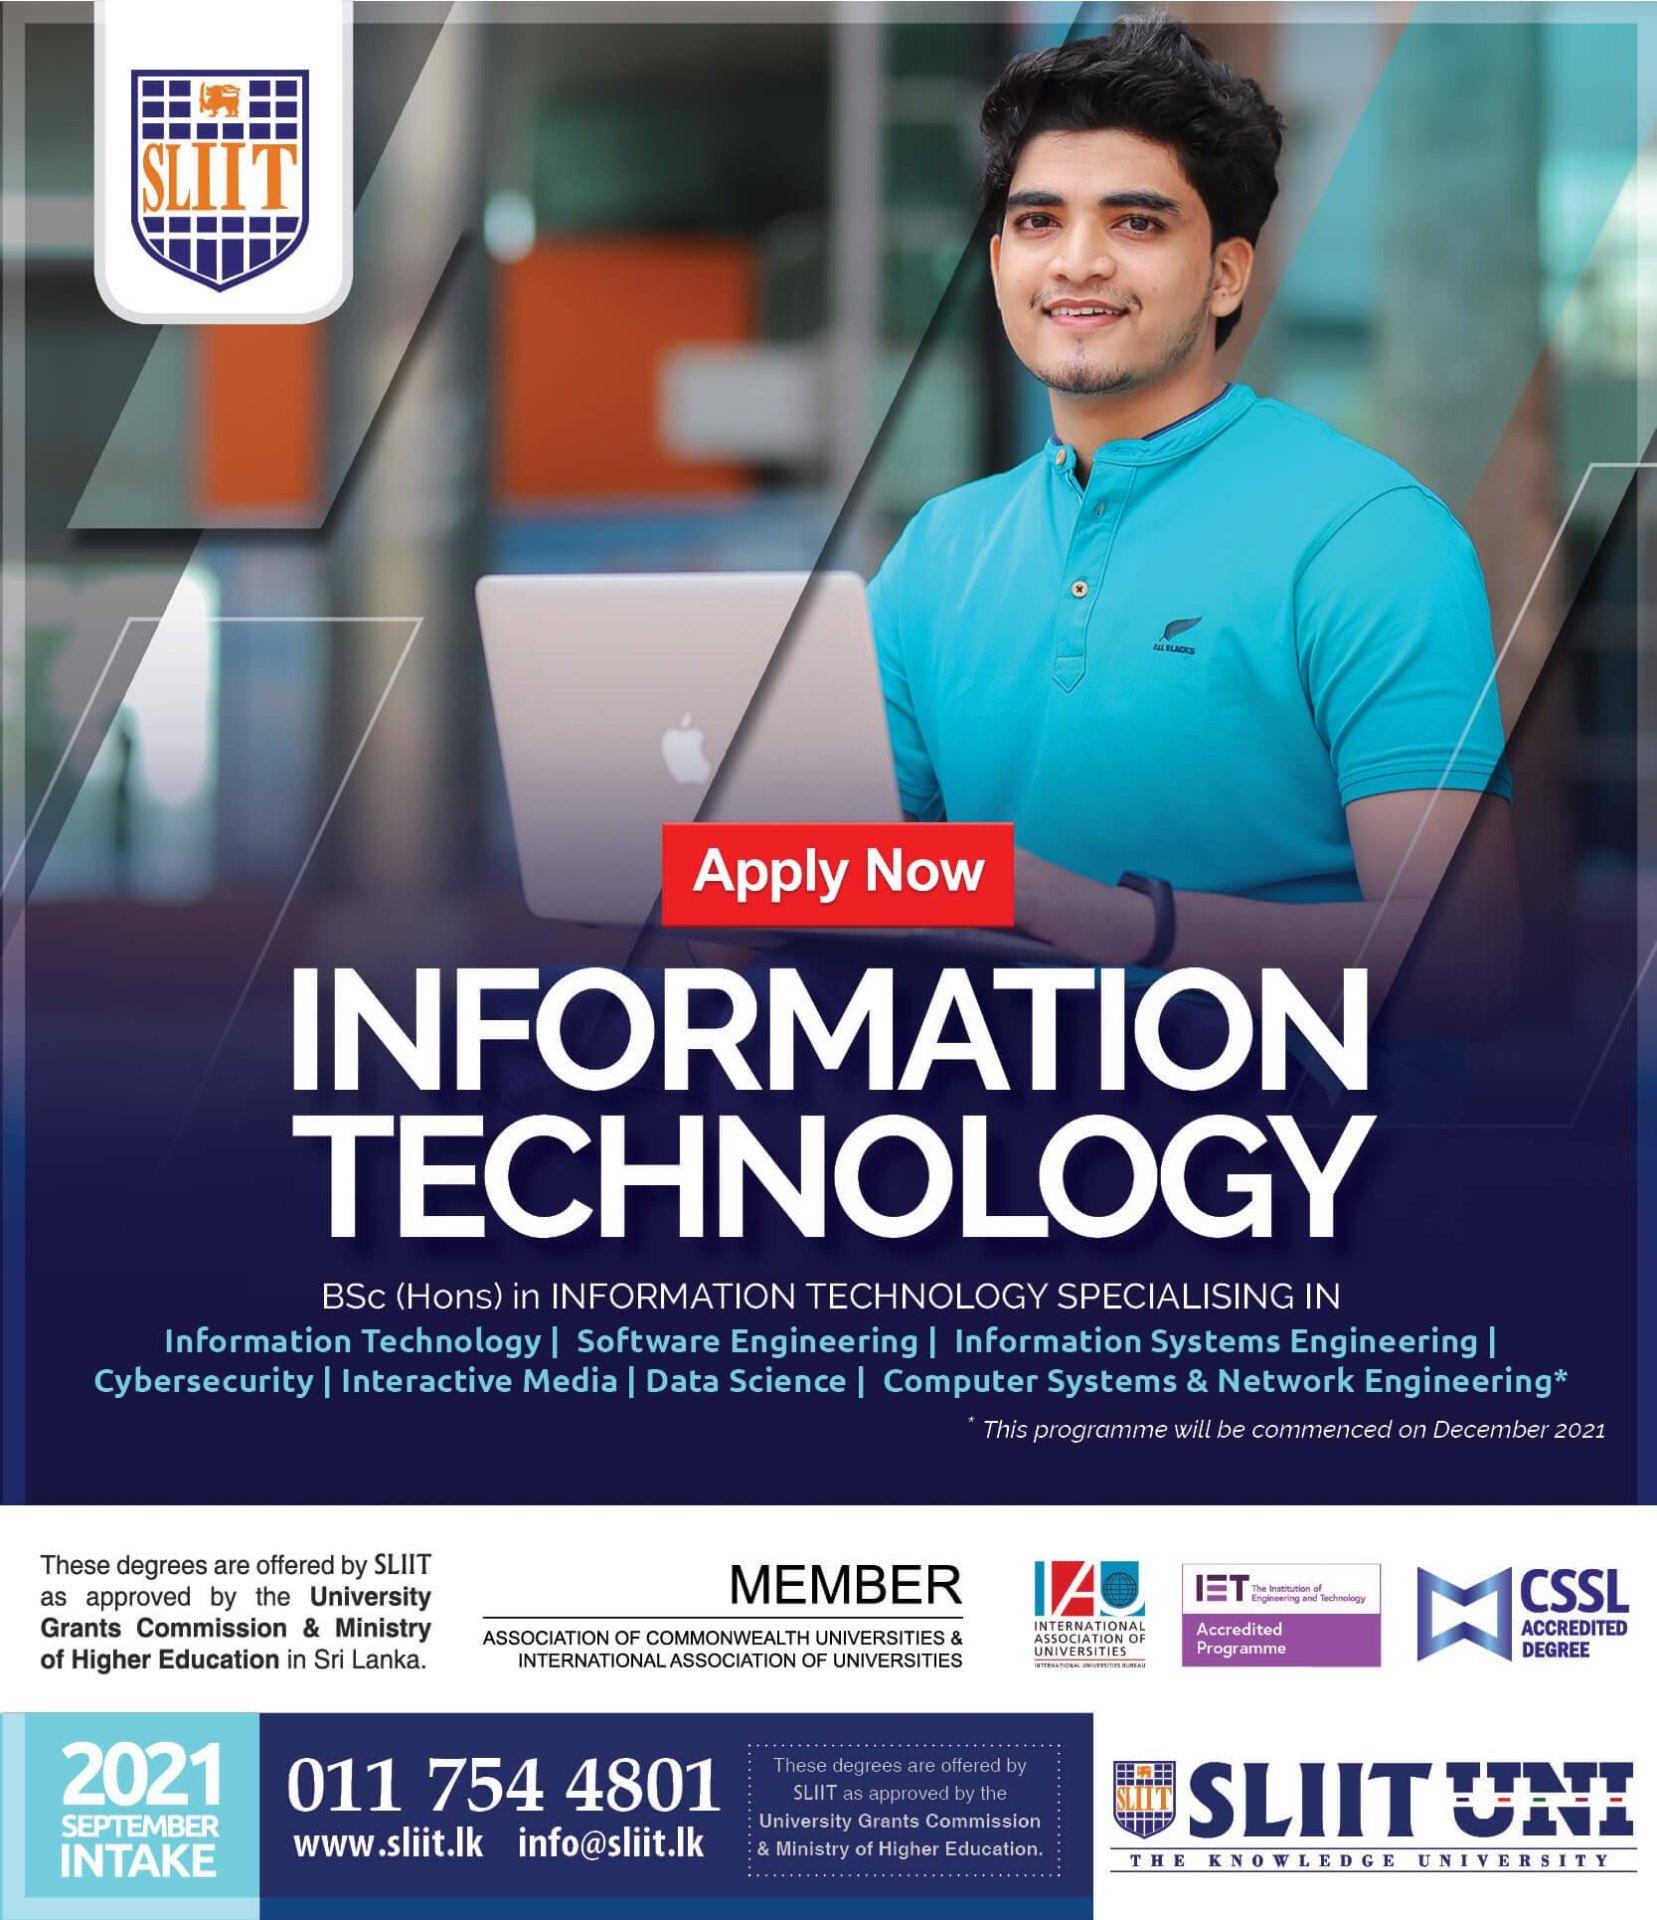 Register now for Computing Degree Programmes at SLIIT